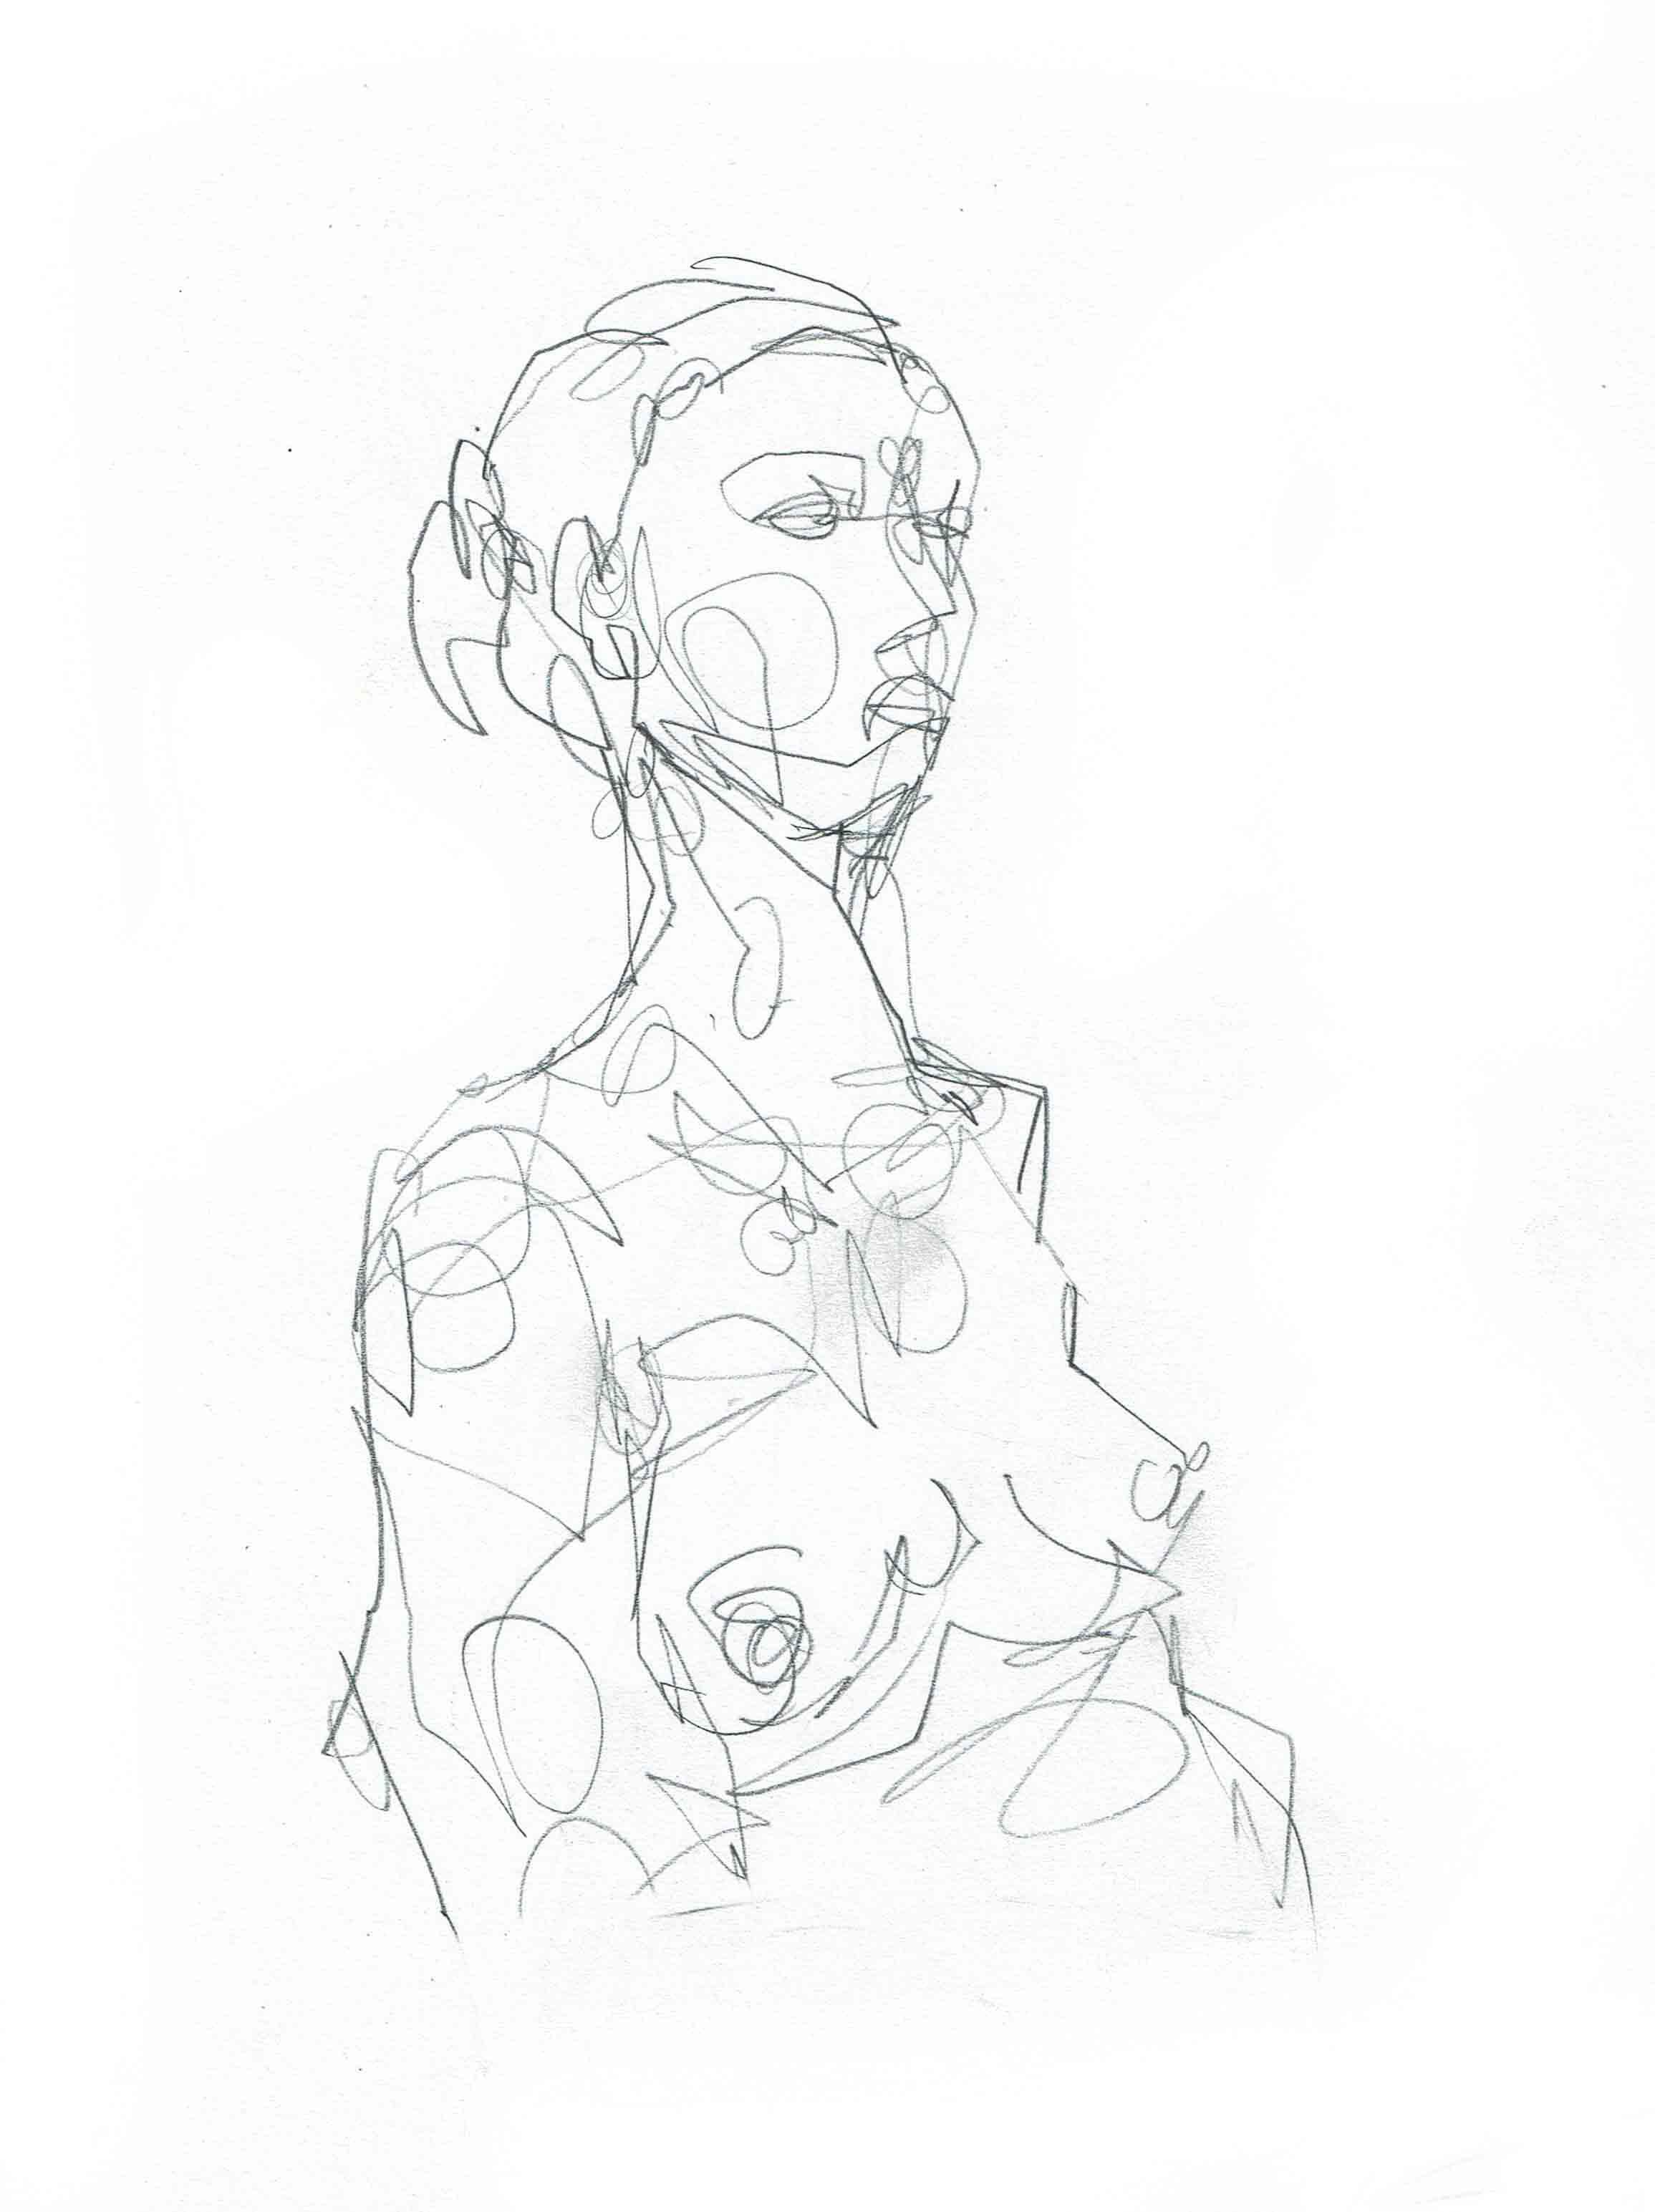 3 min face/torso